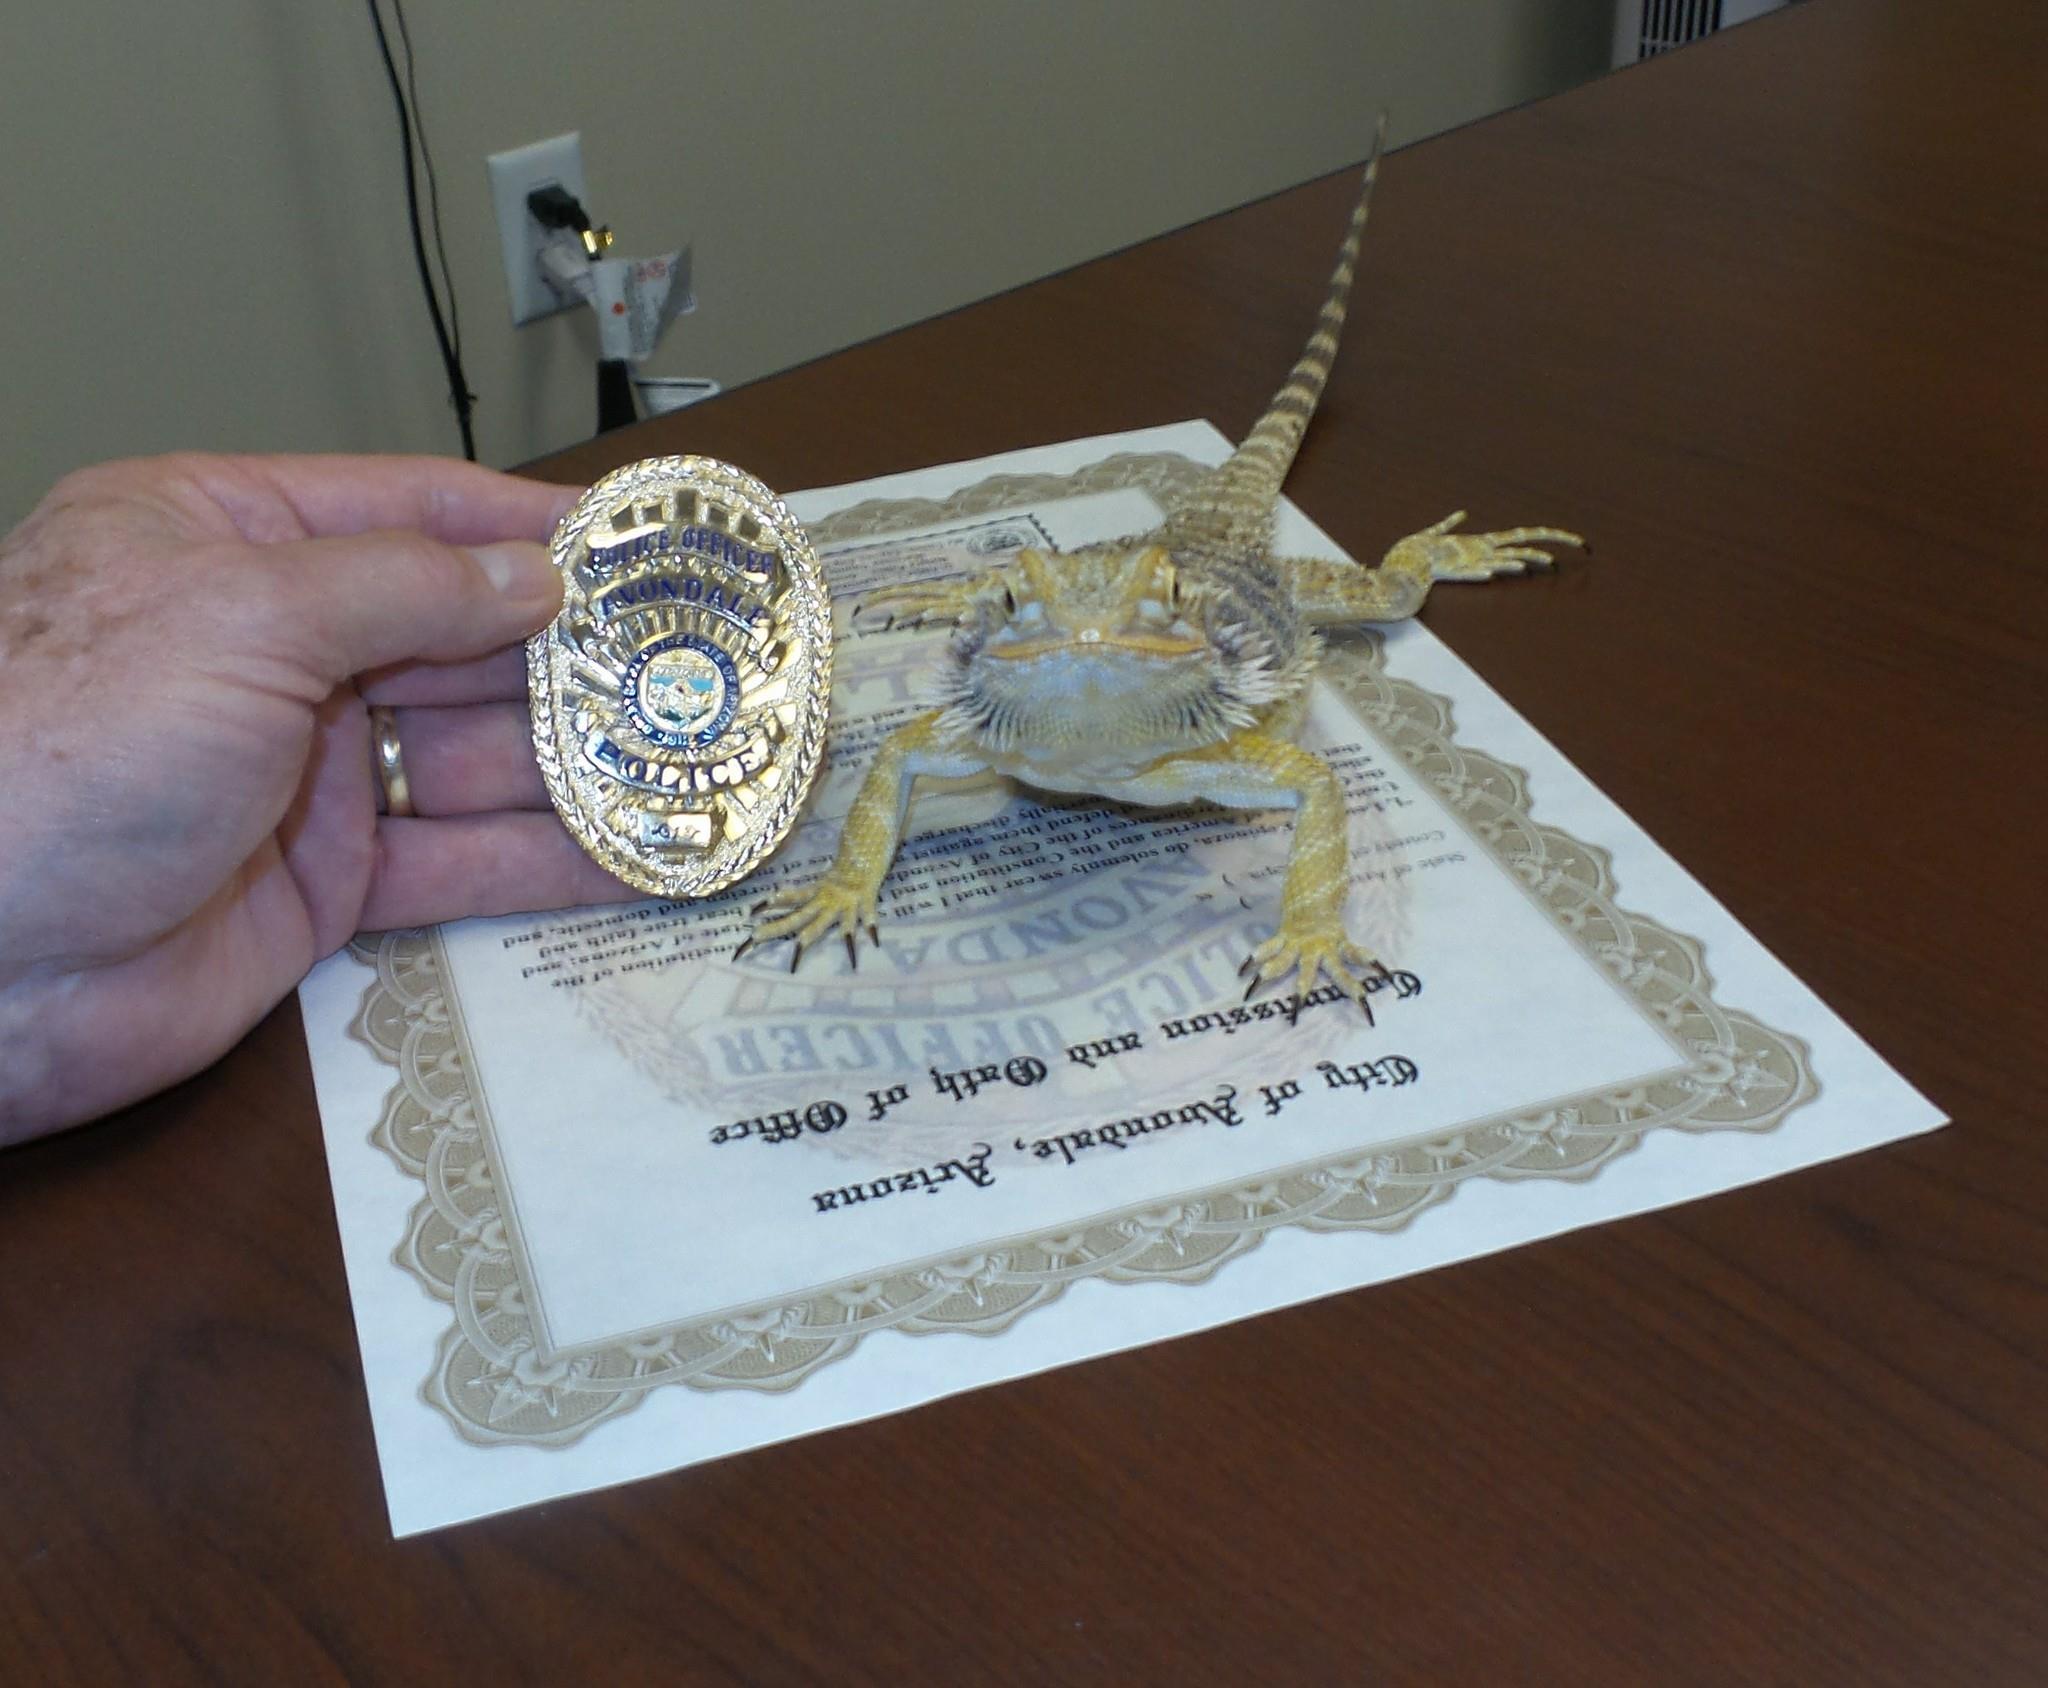 Serious but proud (Source: Avondale Police Department via Facebook)